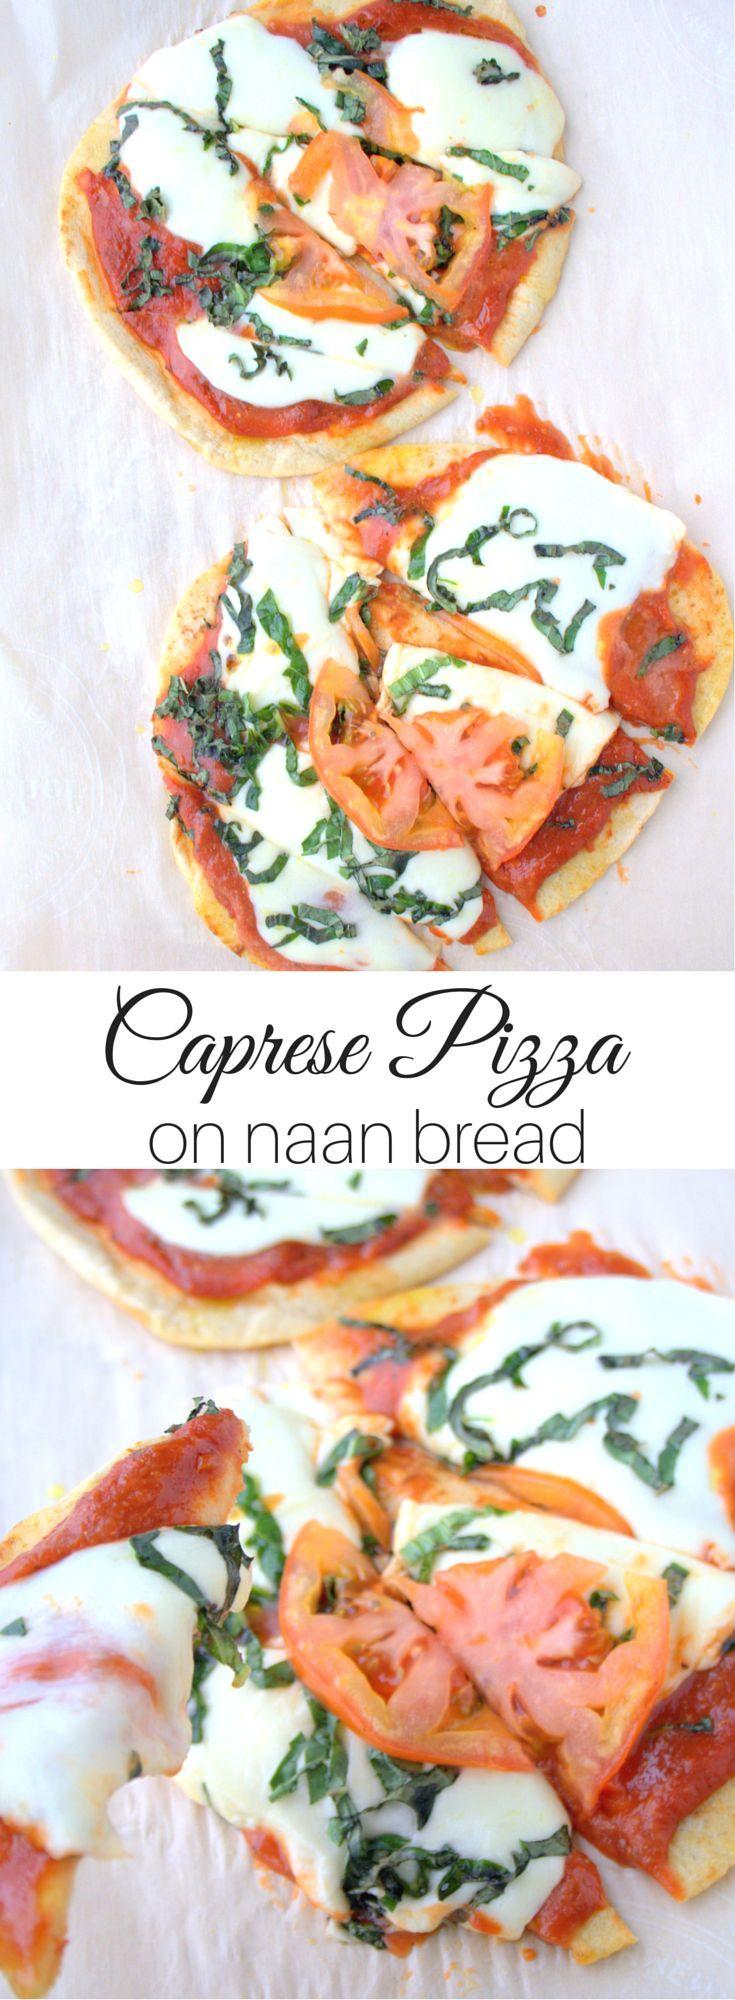 Caprese Pizza on Naan Bread